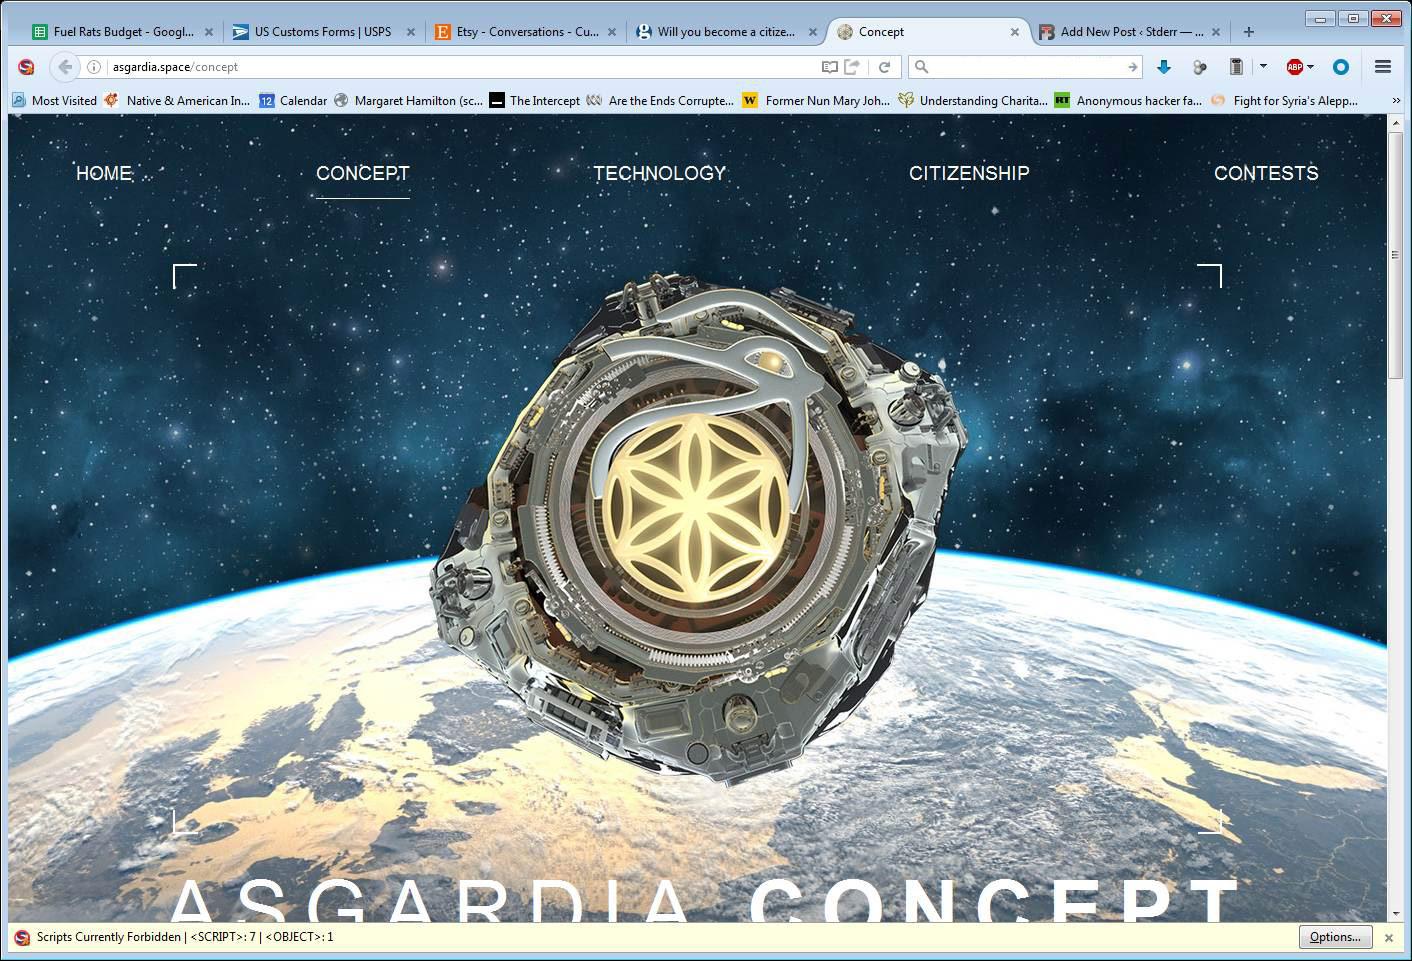 asgardia2